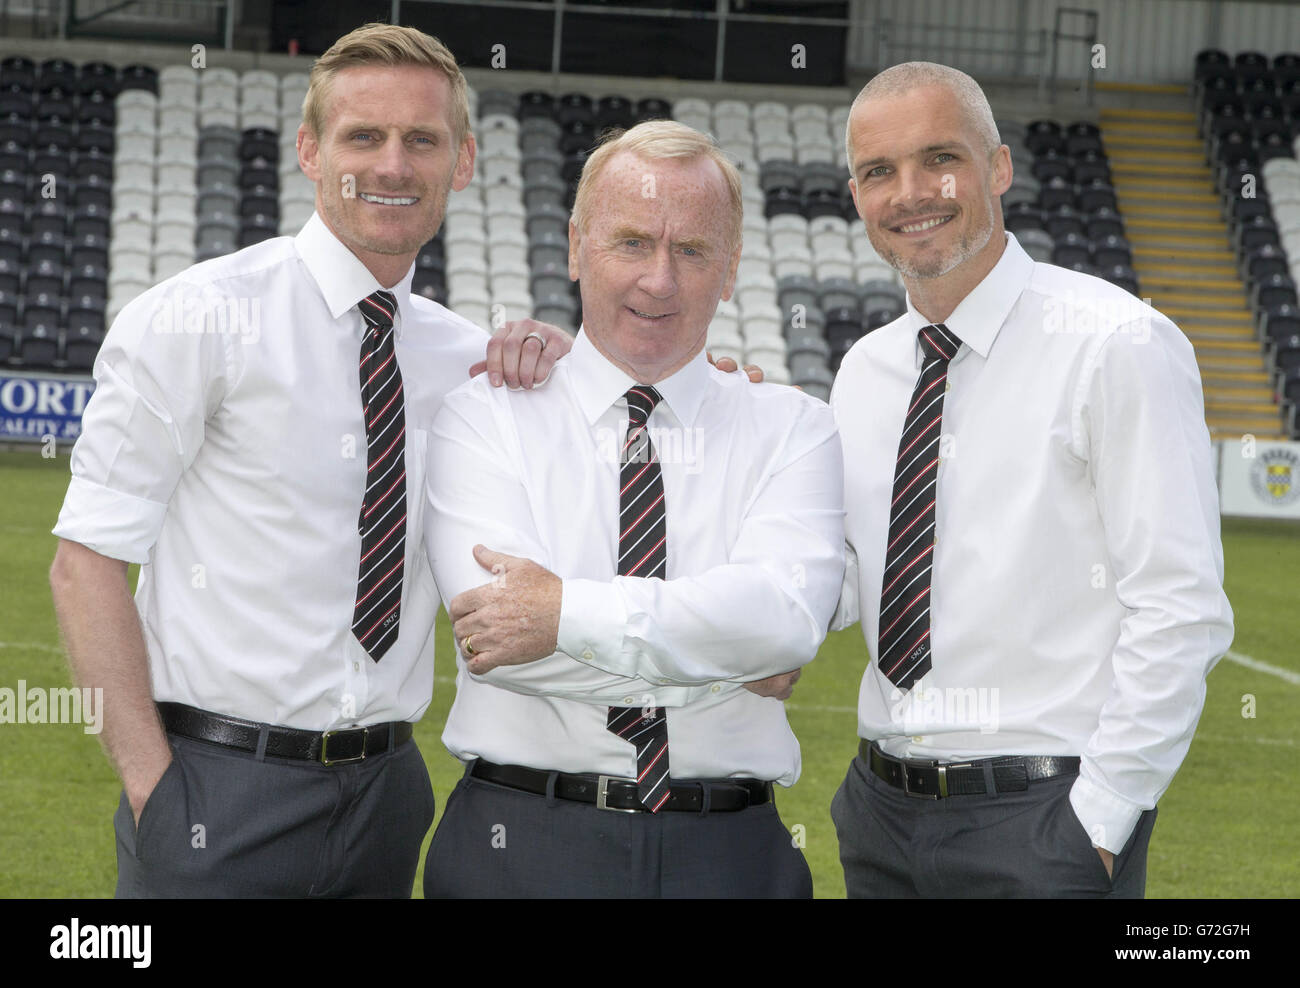 Soccer - St Mirren Press Conference - Tommy Craig Unveiling - St Mirren Park - Stock Image